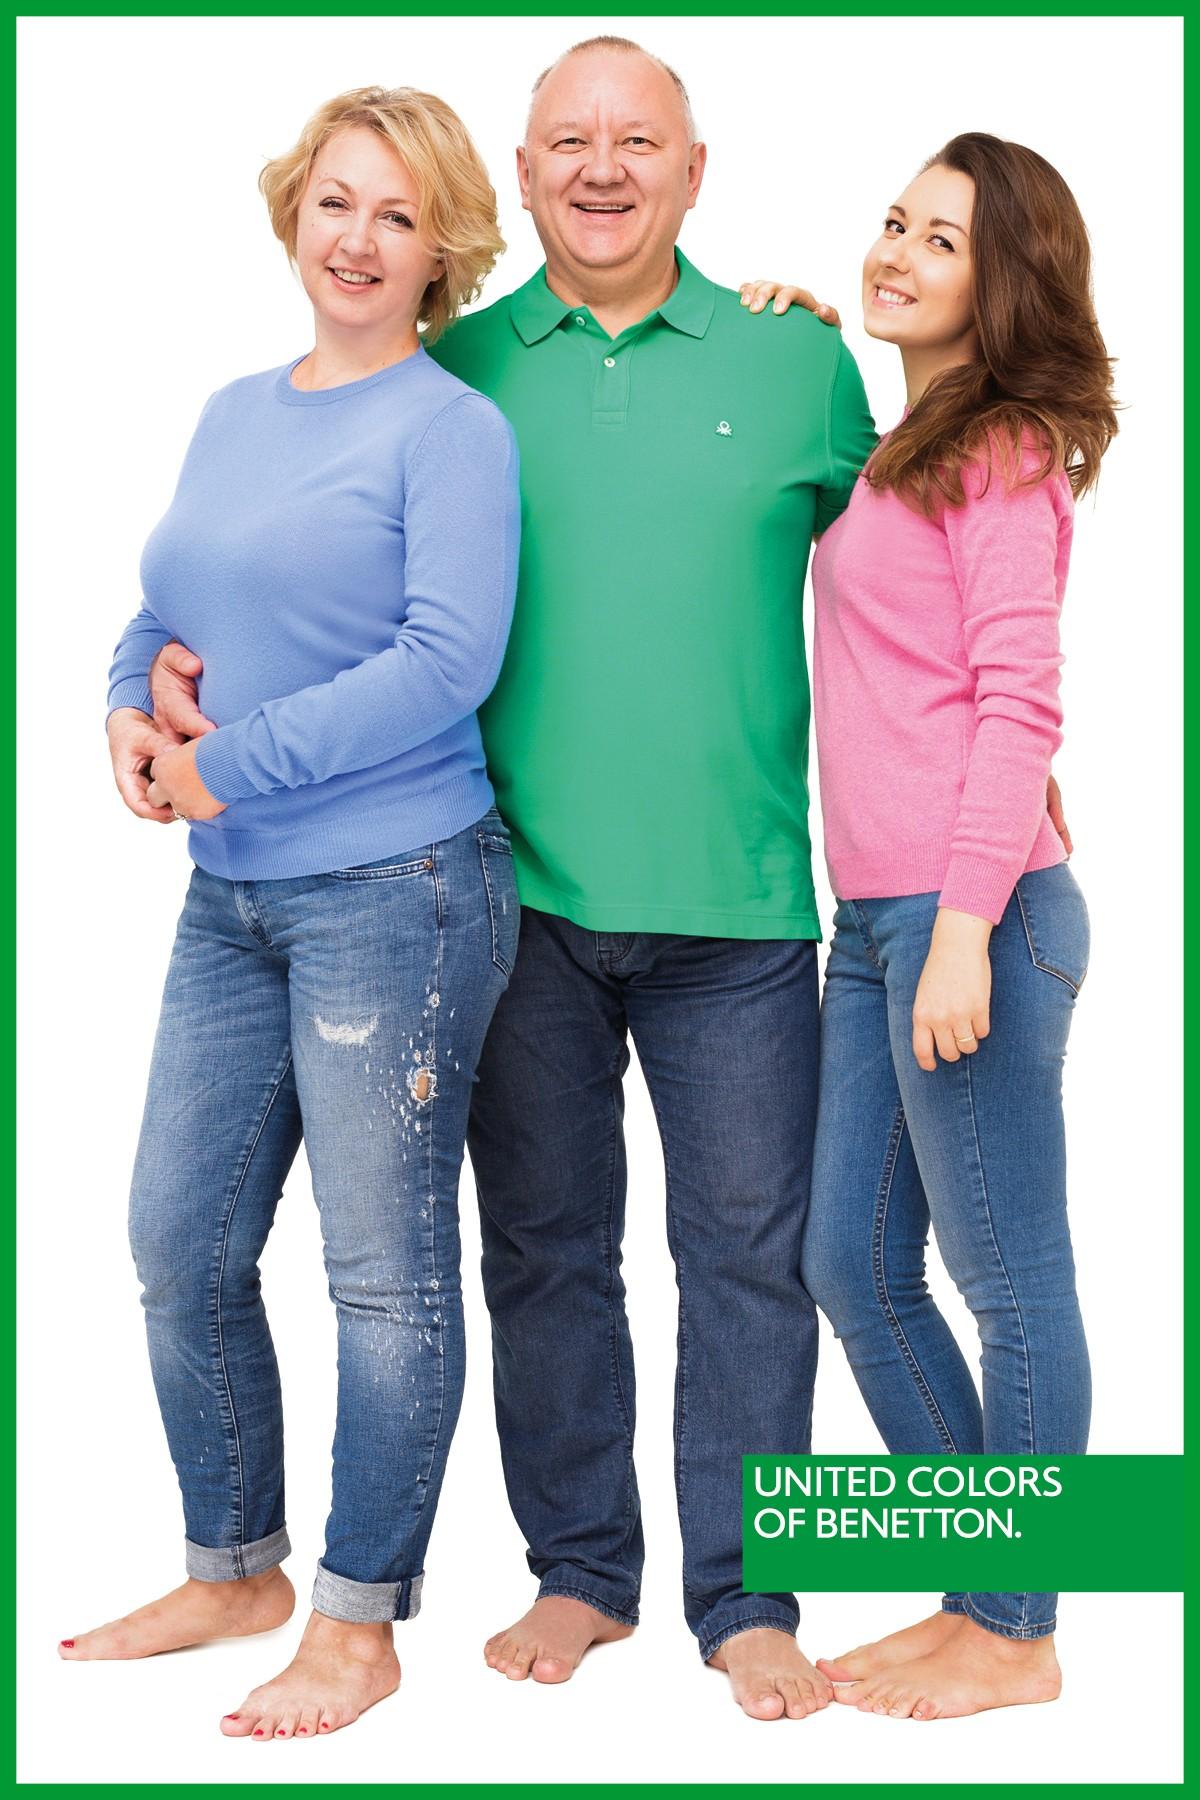 benetton семья Виеру